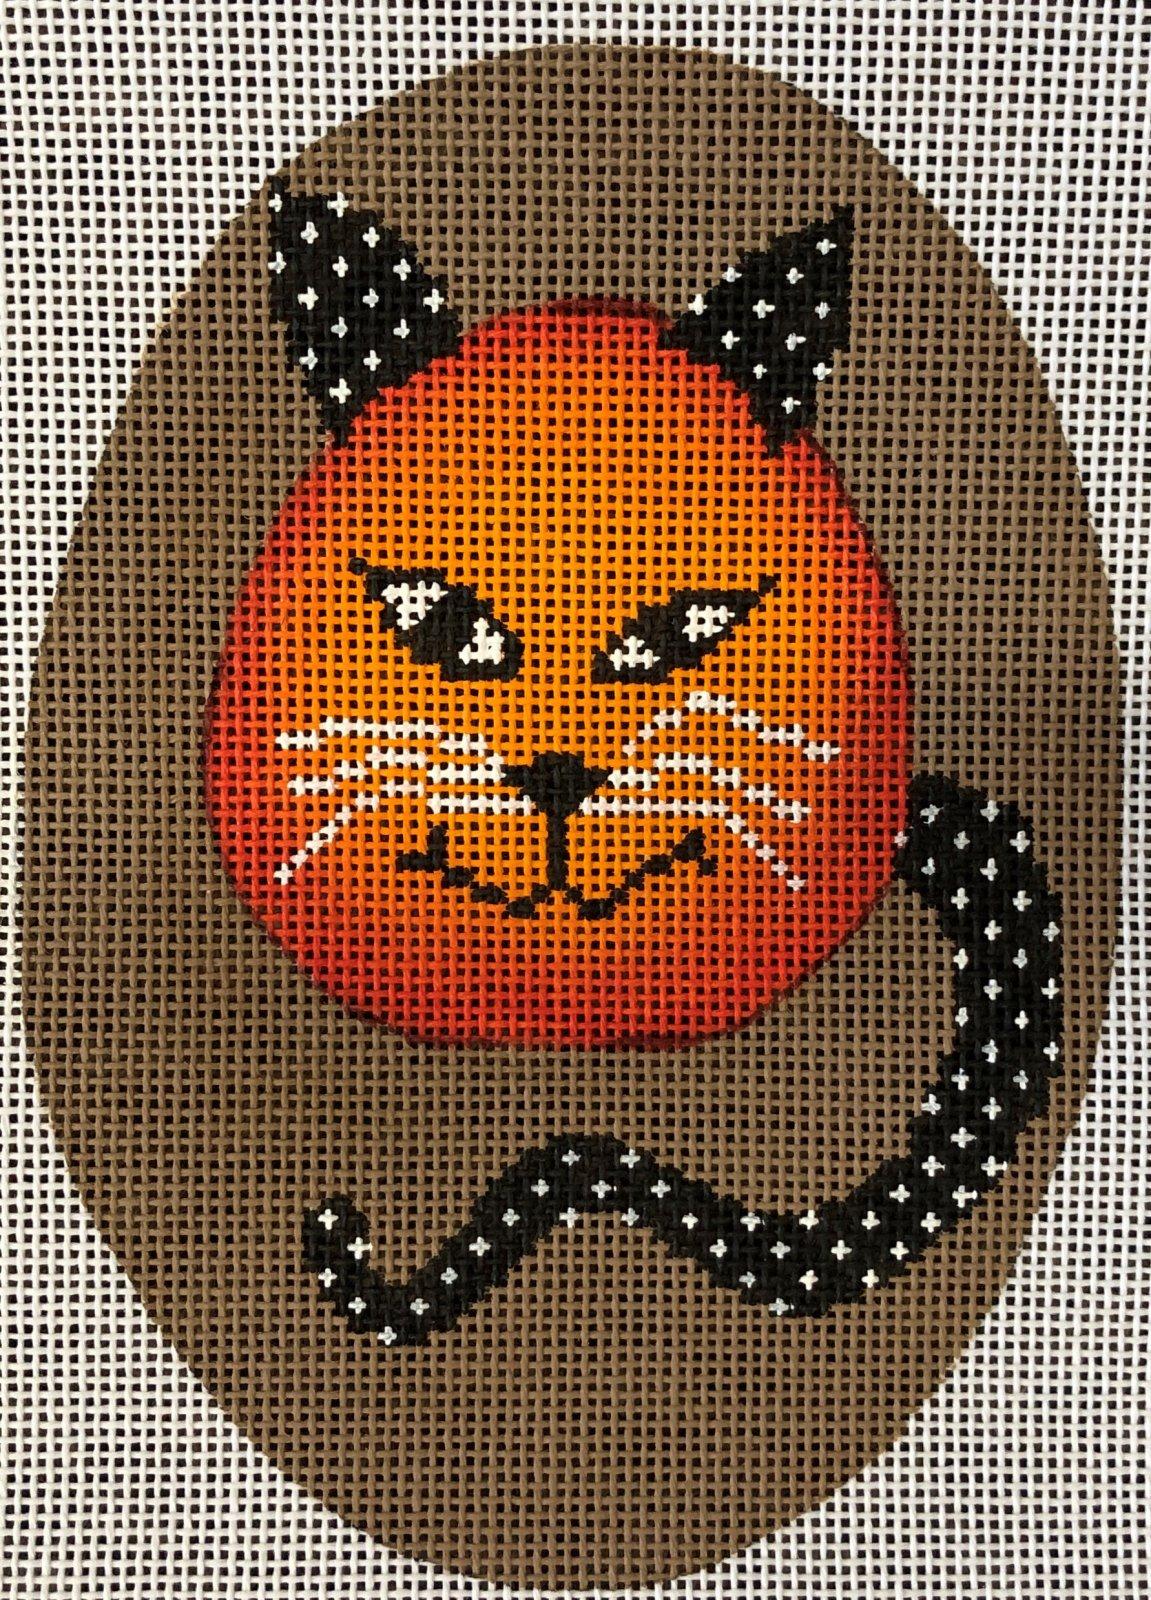 DTK9E - CAT HALLOWEEN ORN